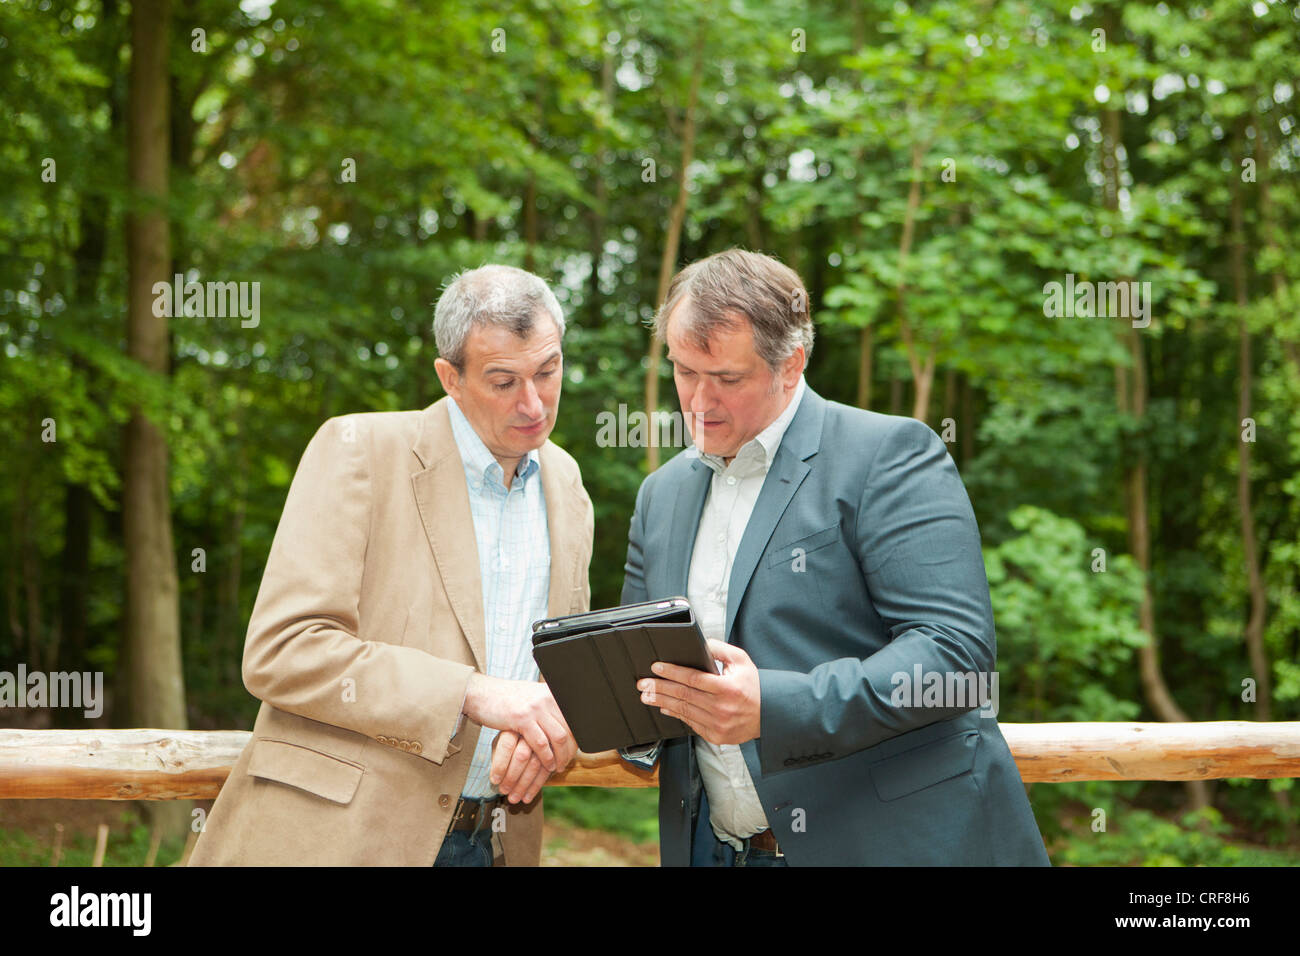 Businessmen using tablet computer - Stock Image